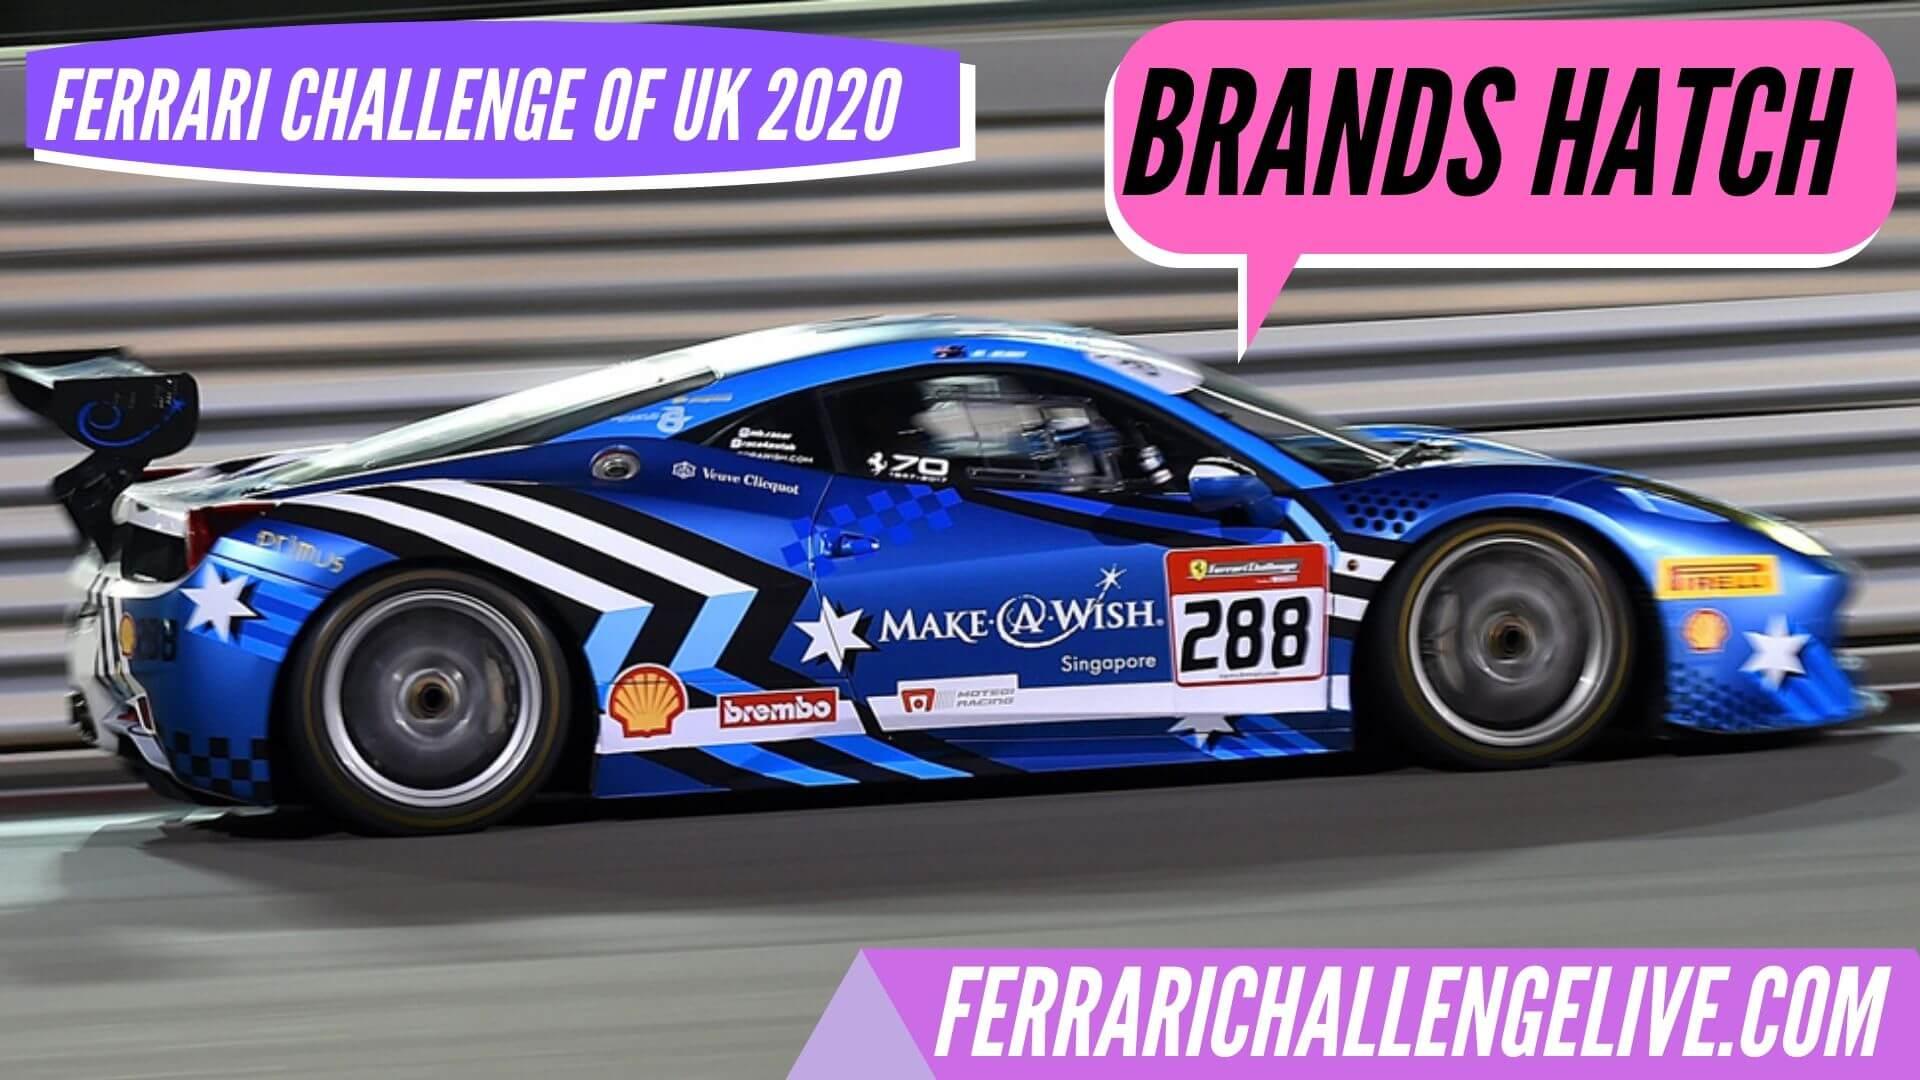 Brands Hatch Live Stream 2020 | Ferrari Challenge UK